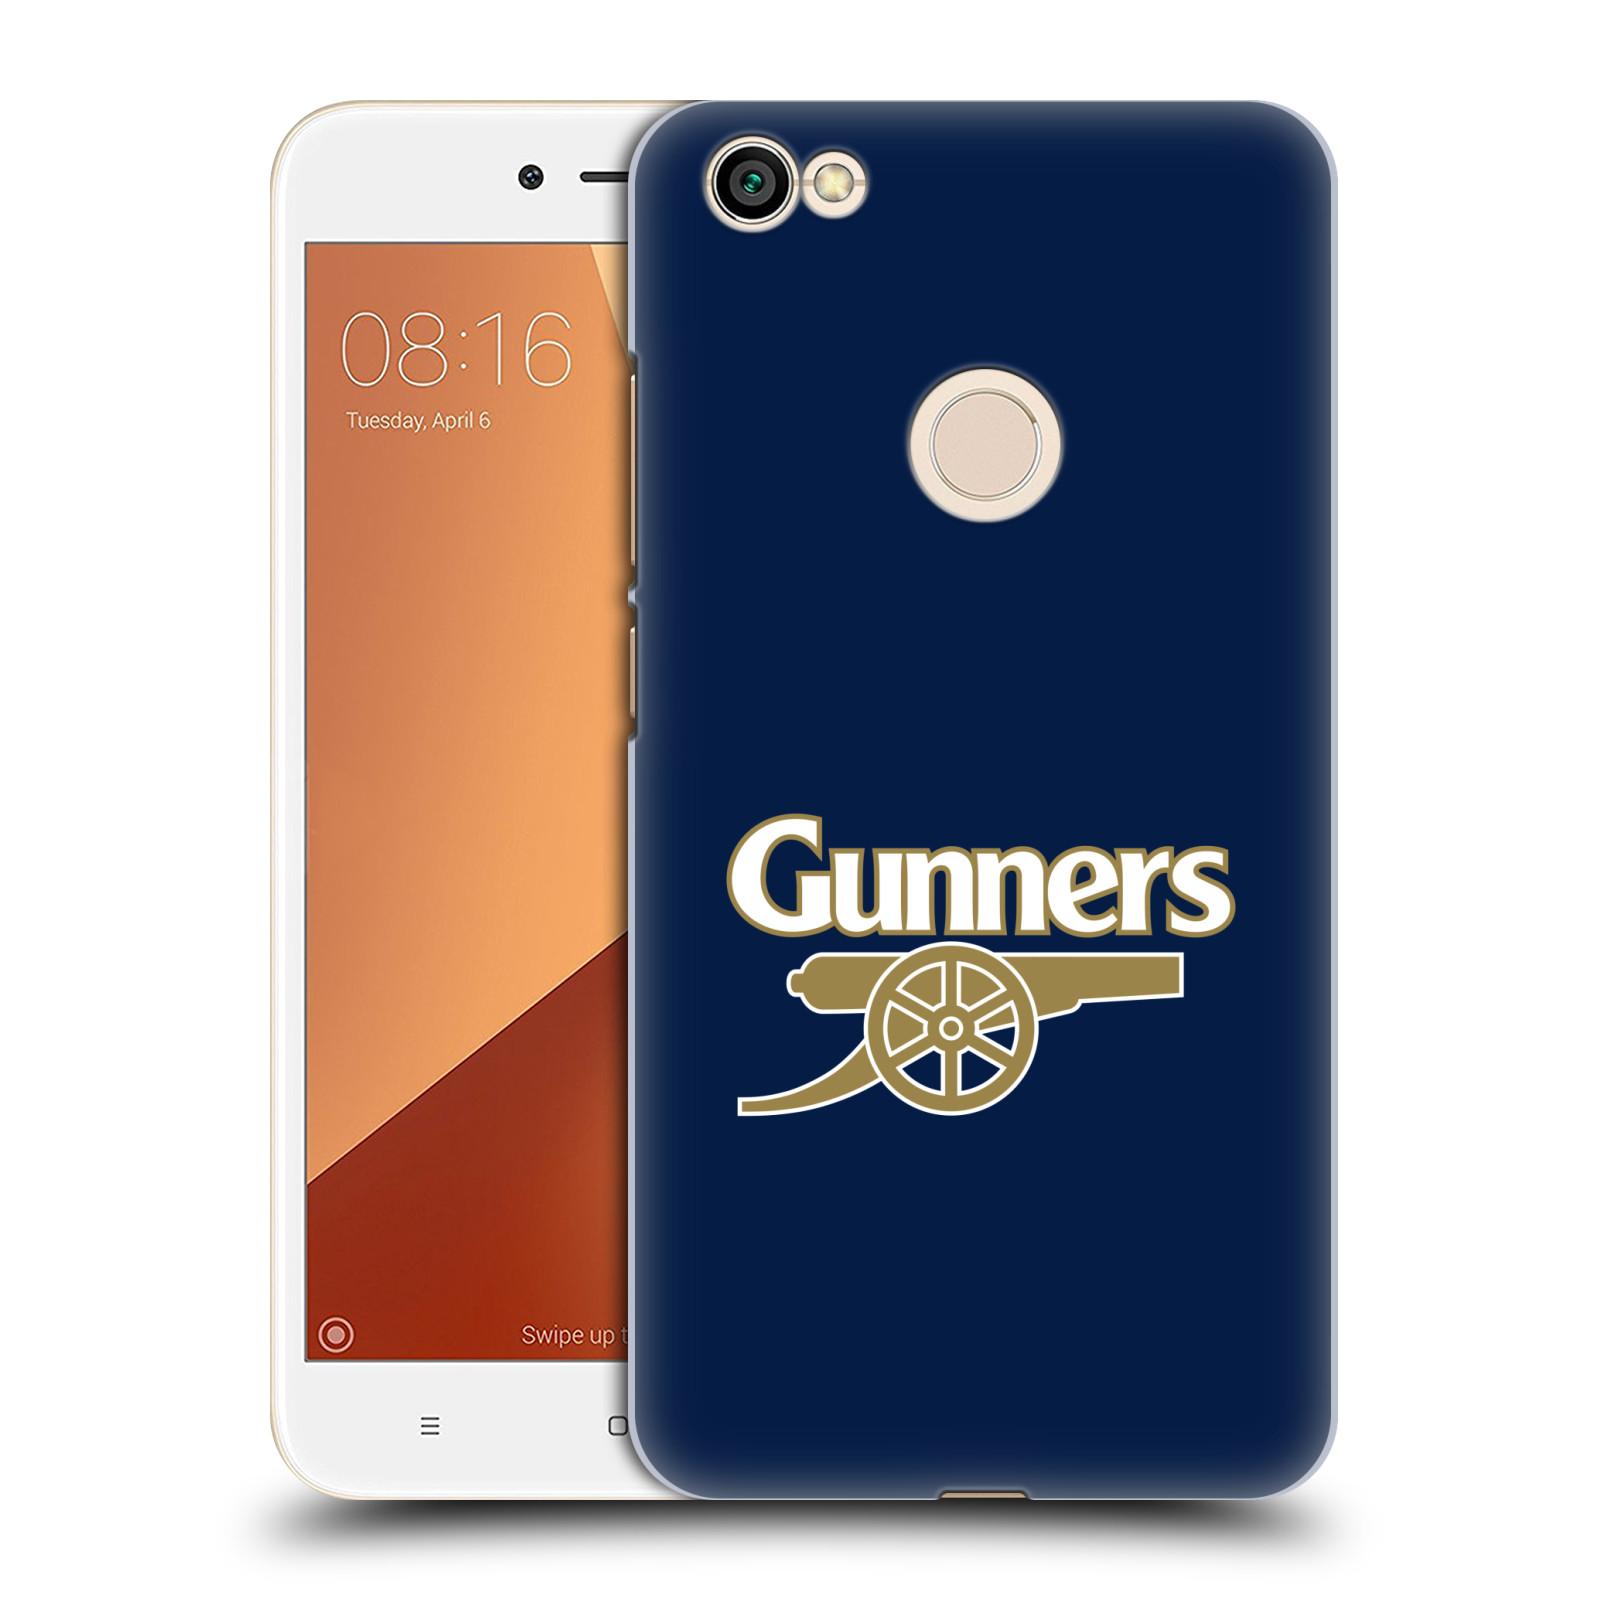 Plastové pouzdro na mobil Xiaomi Redmi Note 5A Prime - Head Case - Arsenal FC - Gunners